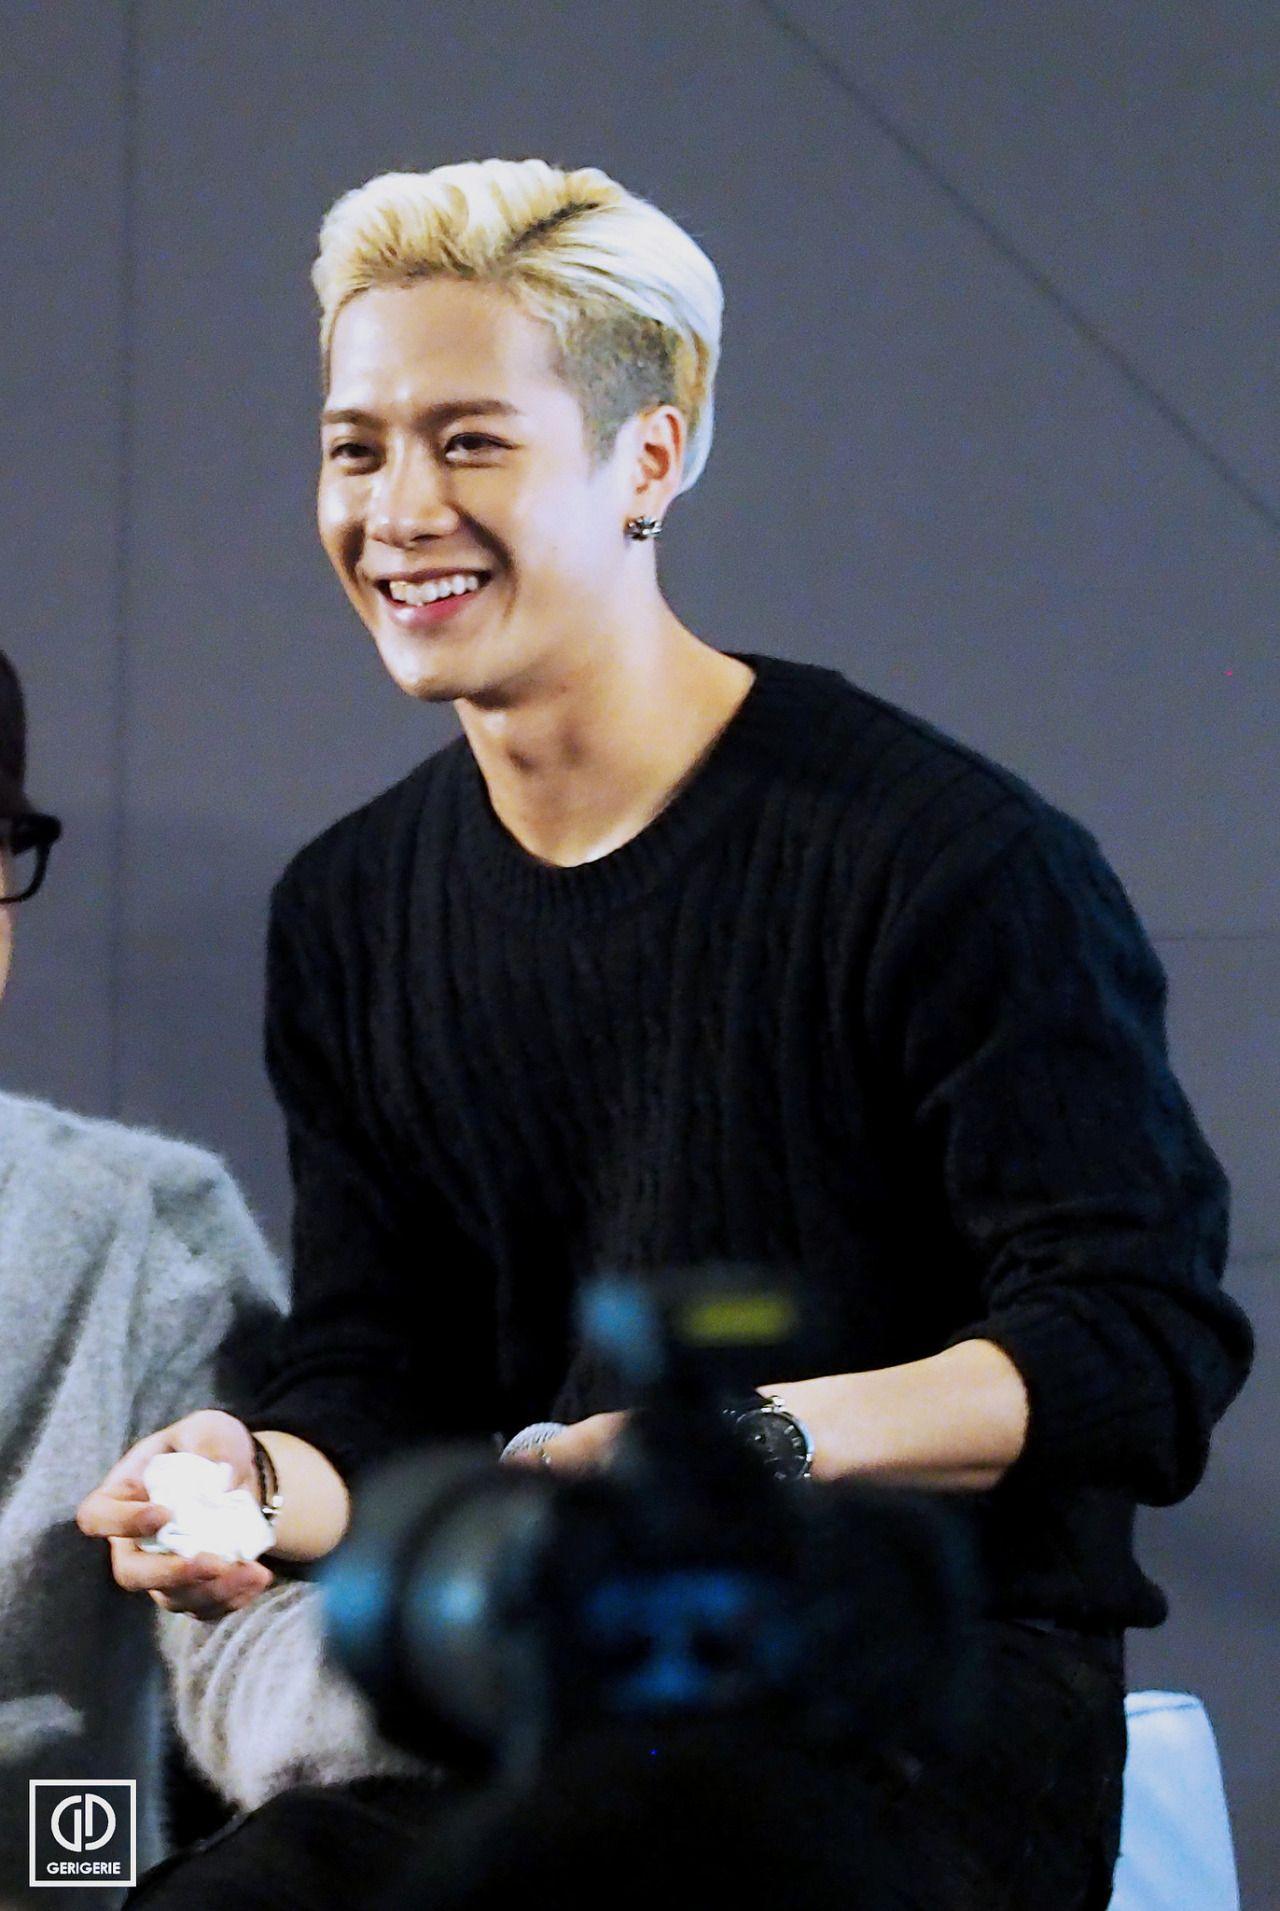 Jackson Love That Smile Got7 Jackson Jackson Wang Jackson